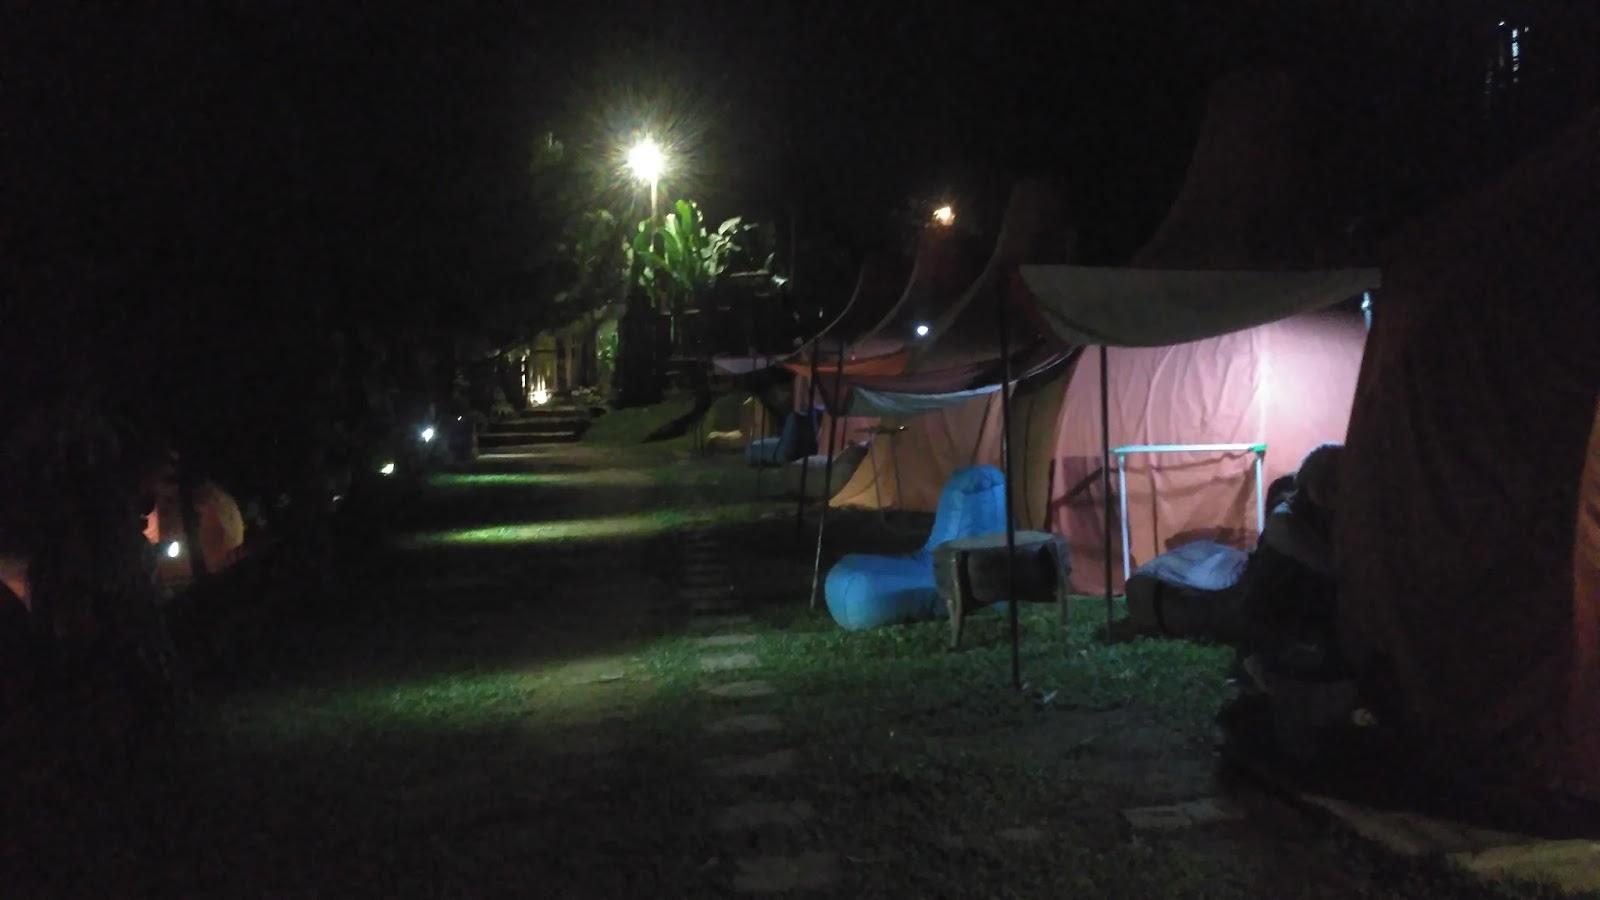 Suasana malam Camping Ground The Lodge Maribaya